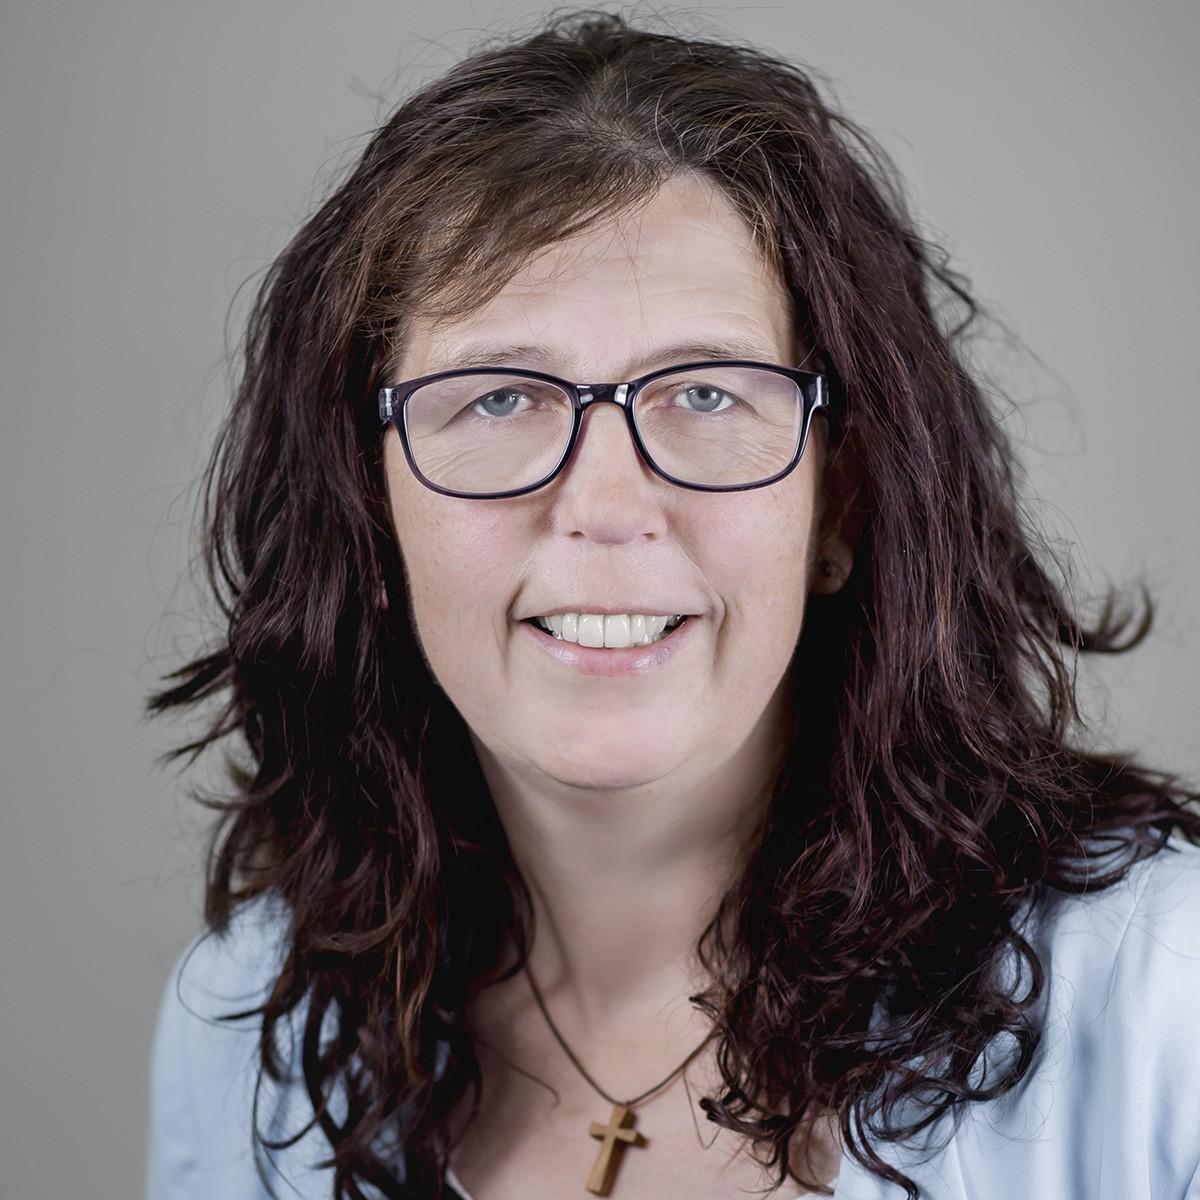 Tina Ehlert